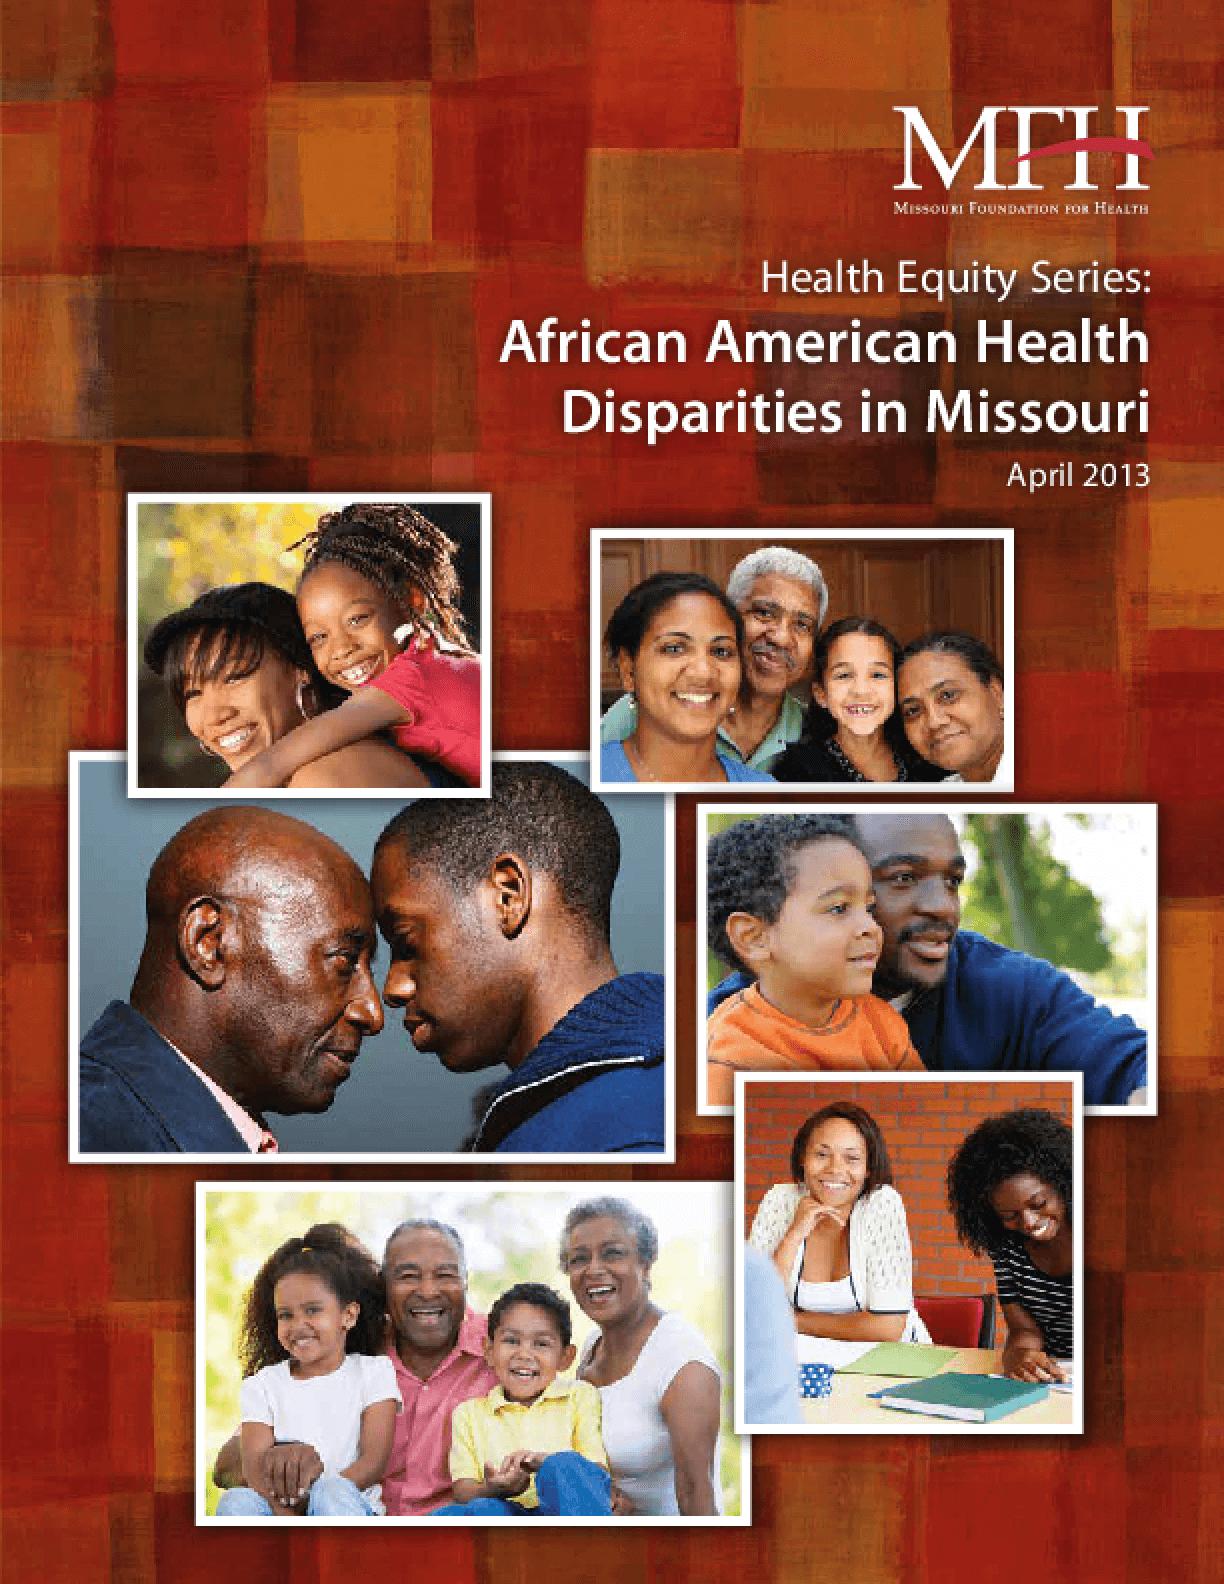 Health Equity Series: African American Health Disparities in Missouri